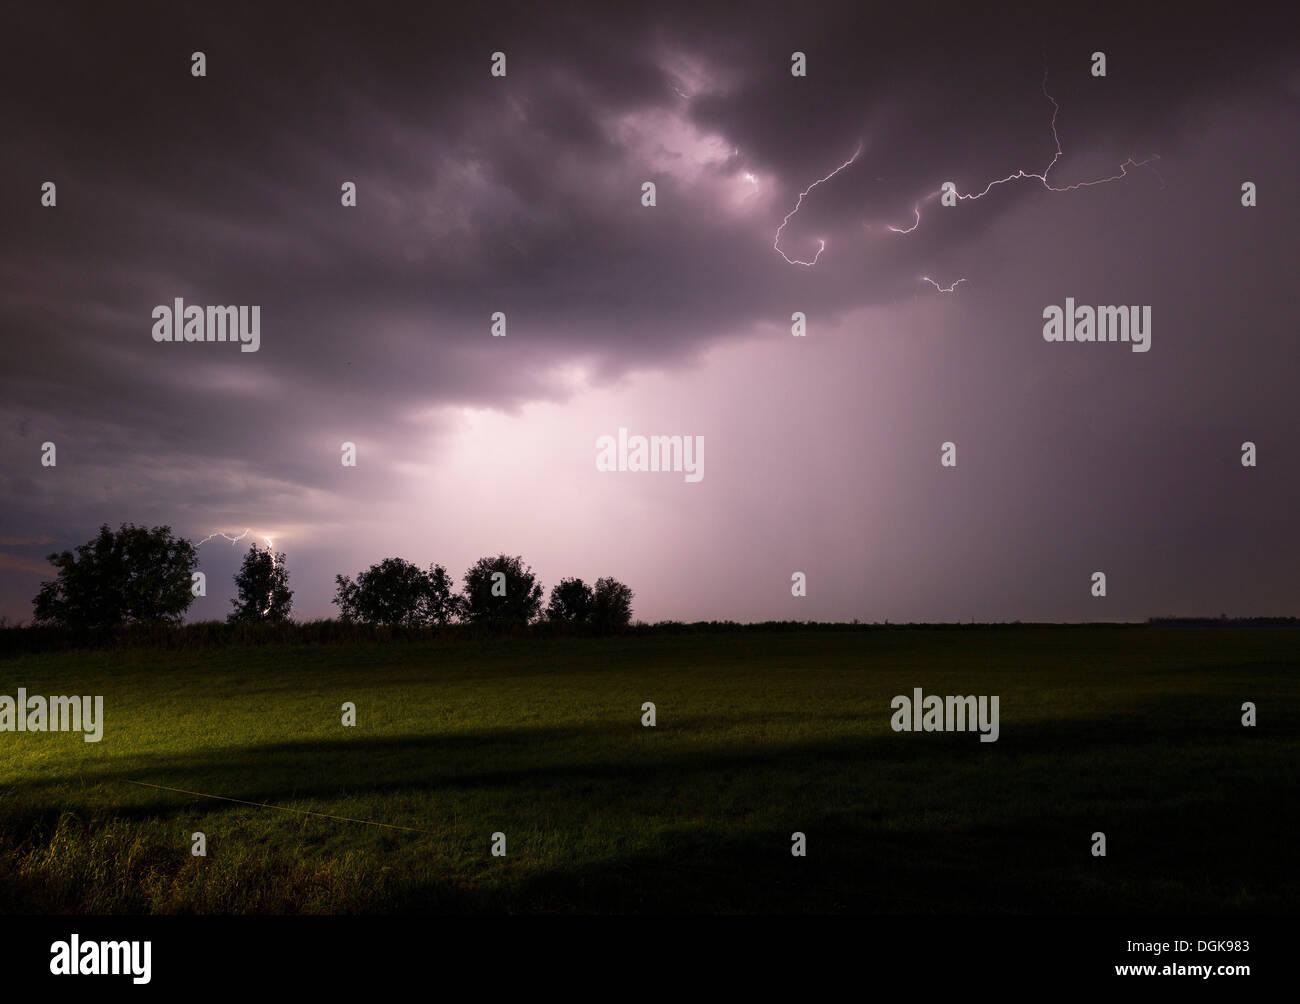 Thunderstorm raging over night sky - Stock Image